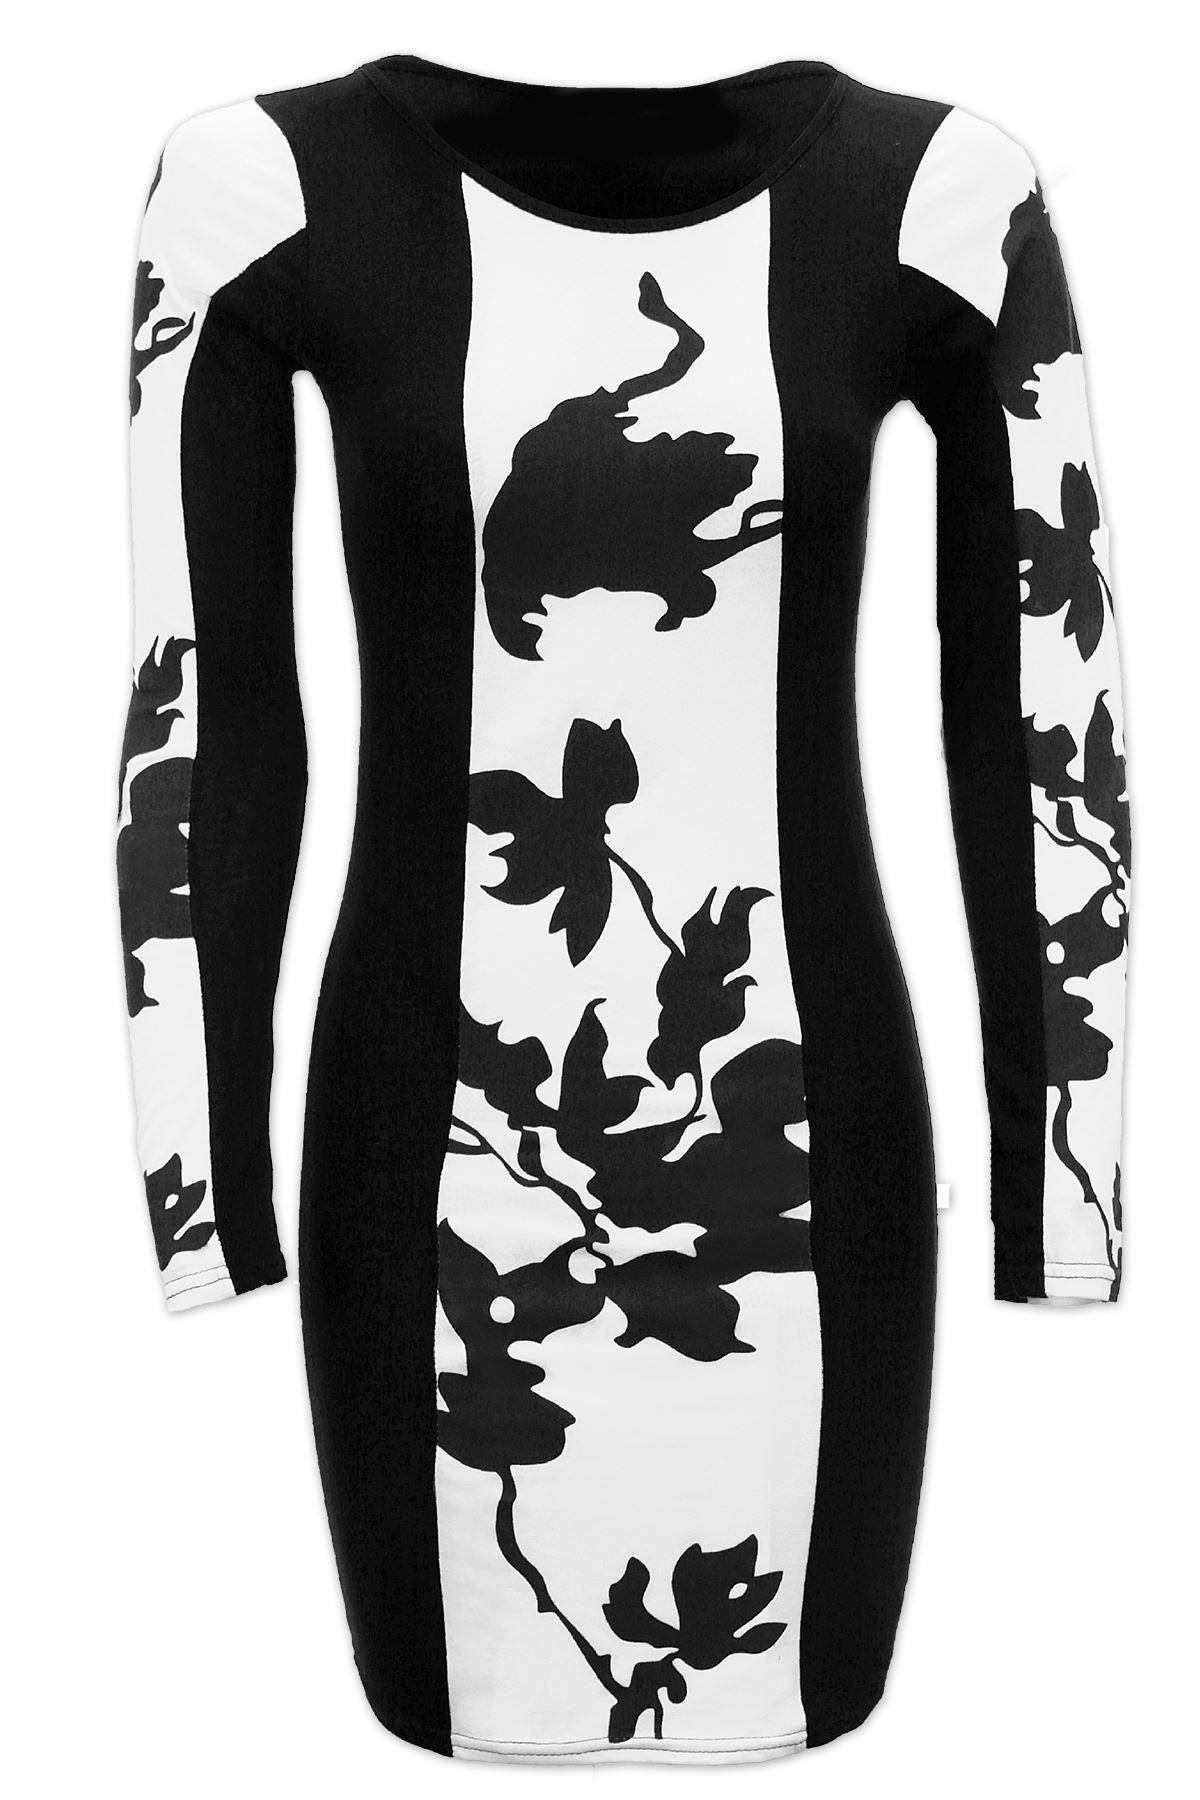 Celeb-Inspired-Leaf-Print-Mini-Short-Women-Bodycon-Dress